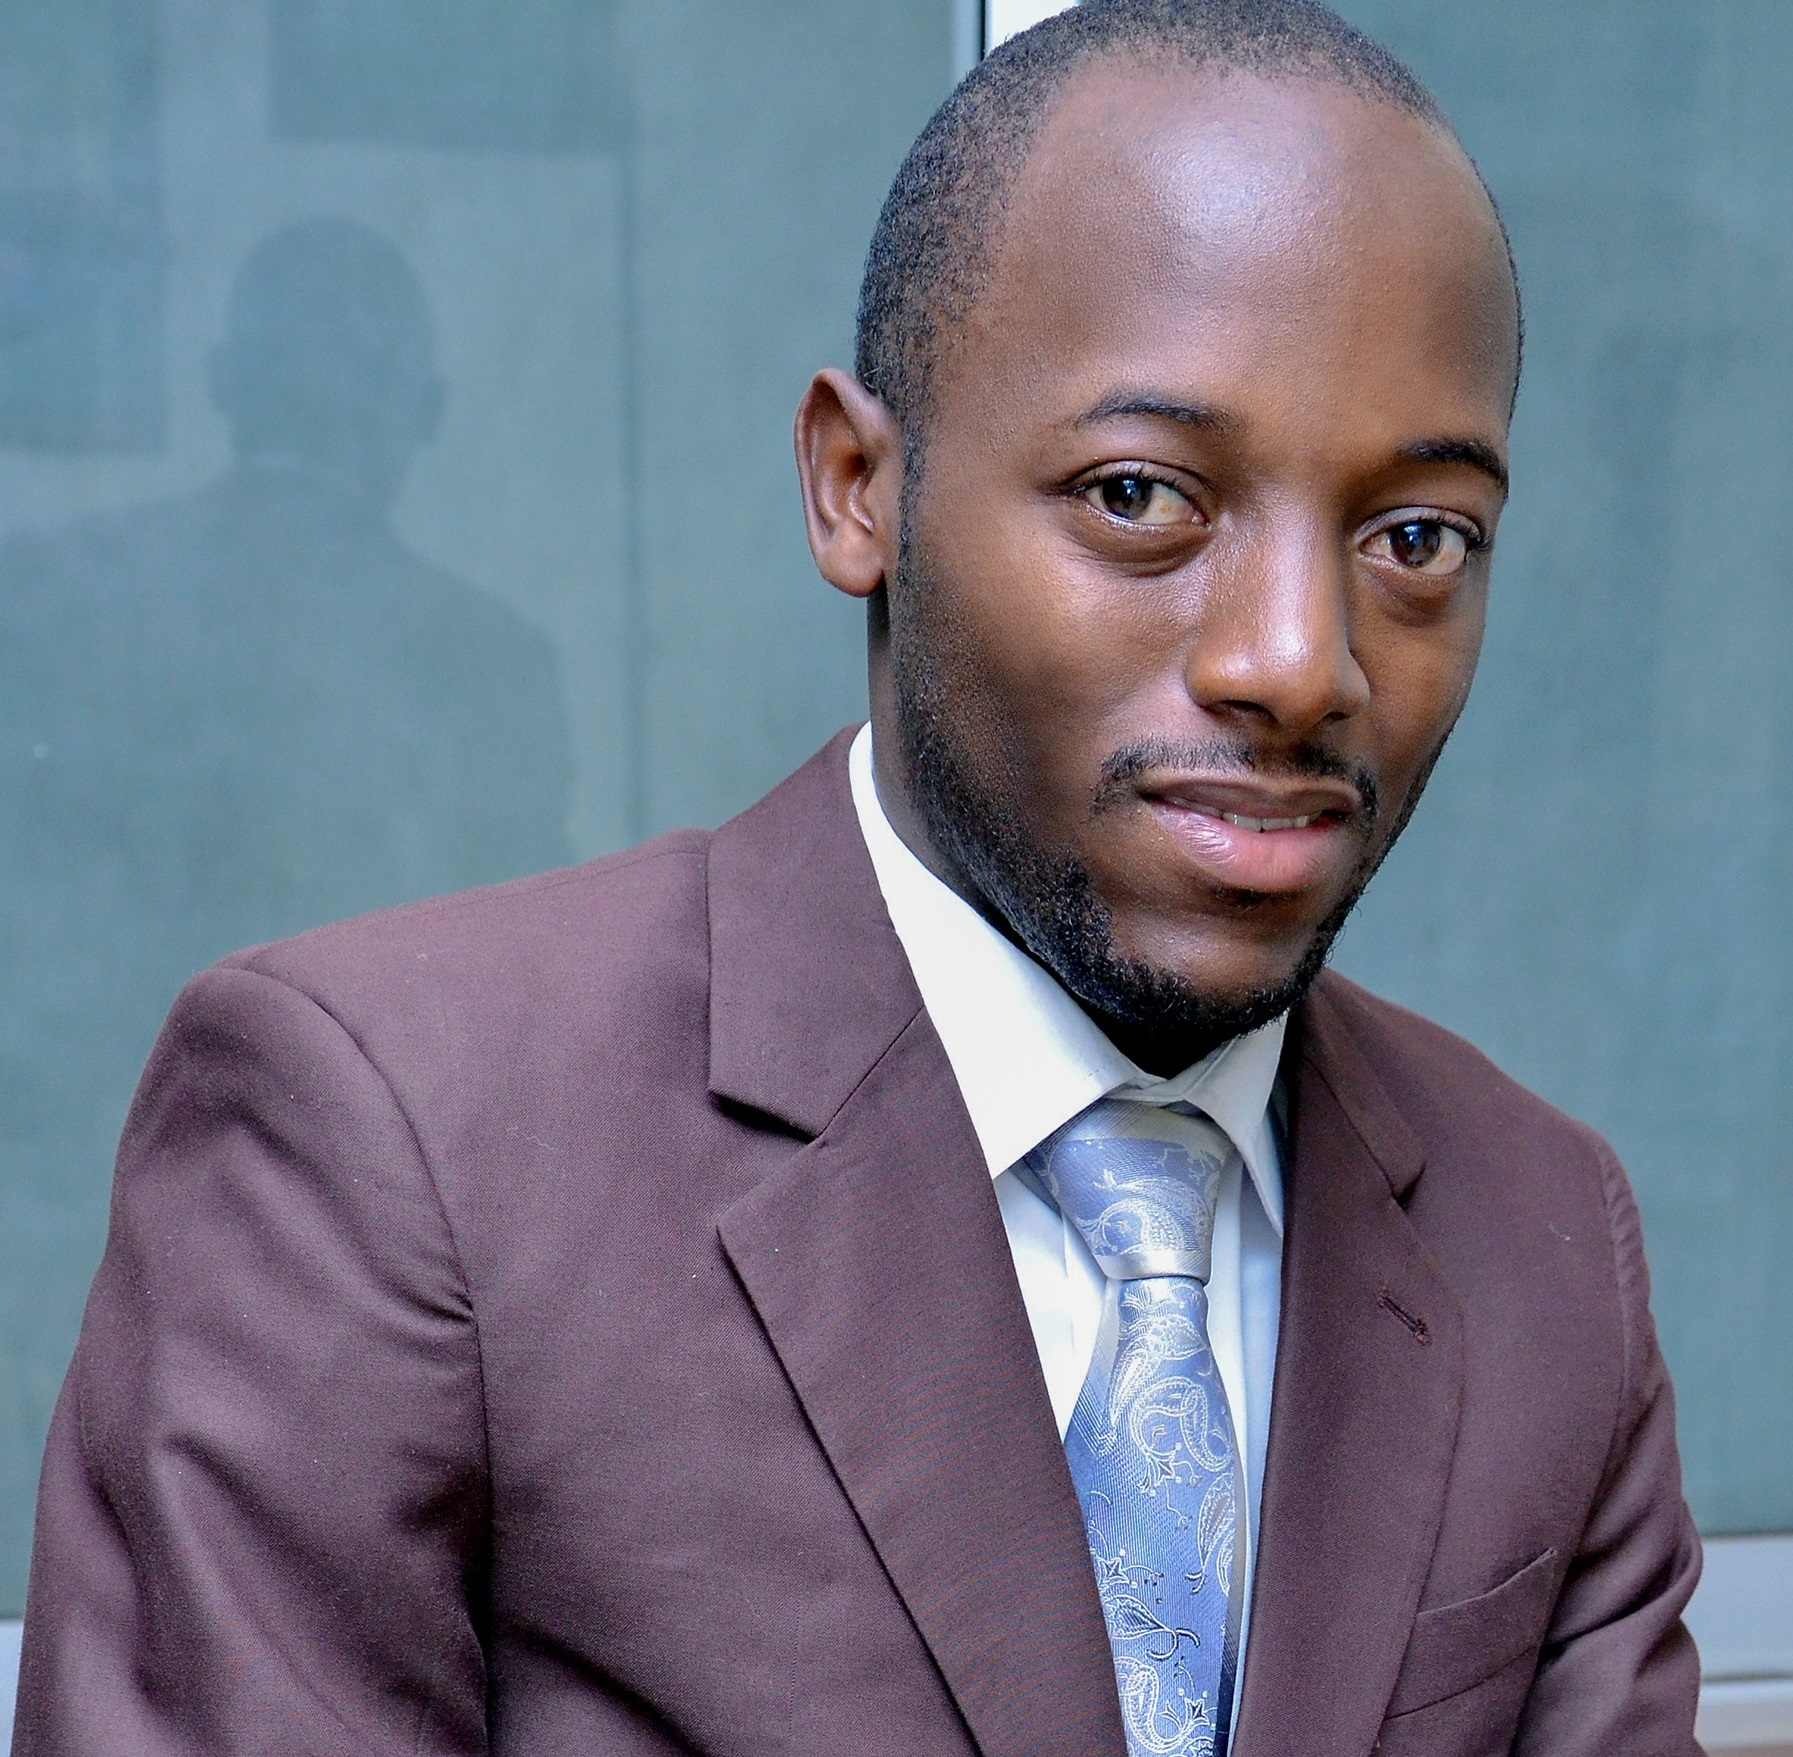 Samuel Lubwama